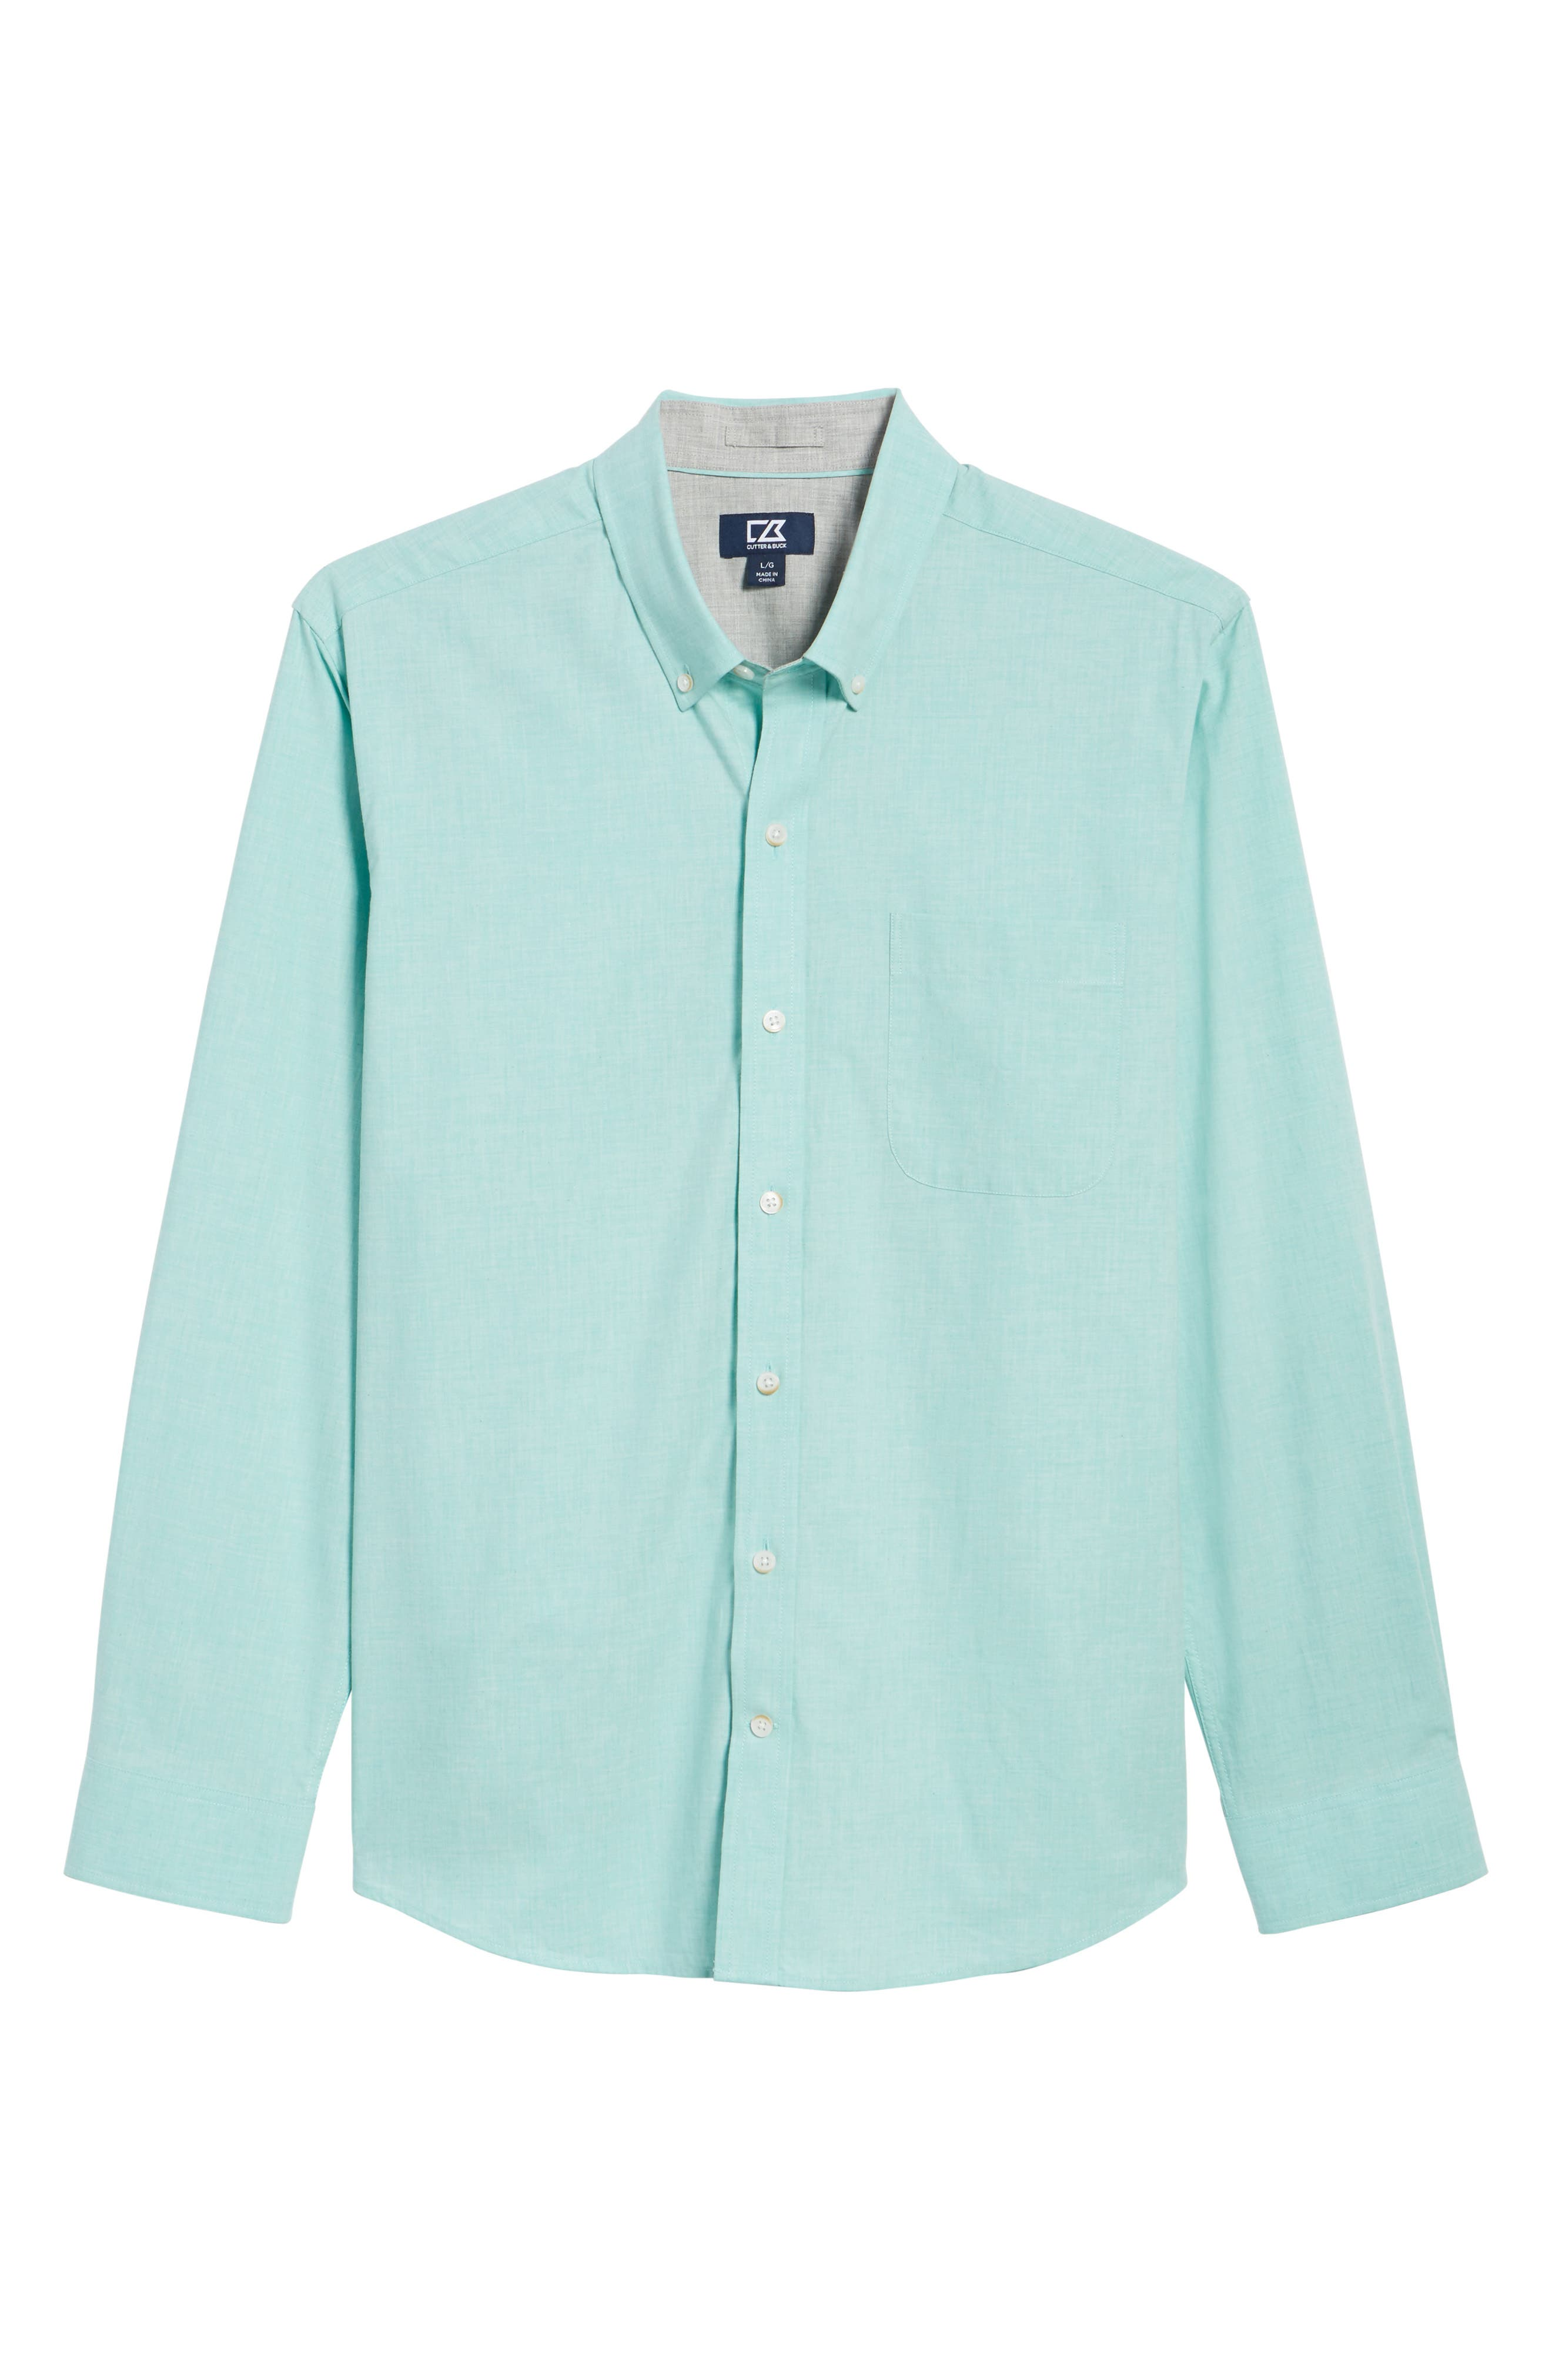 Heather Classic Fit No-Iron Sport Shirt,                             Alternate thumbnail 6, color,                             328